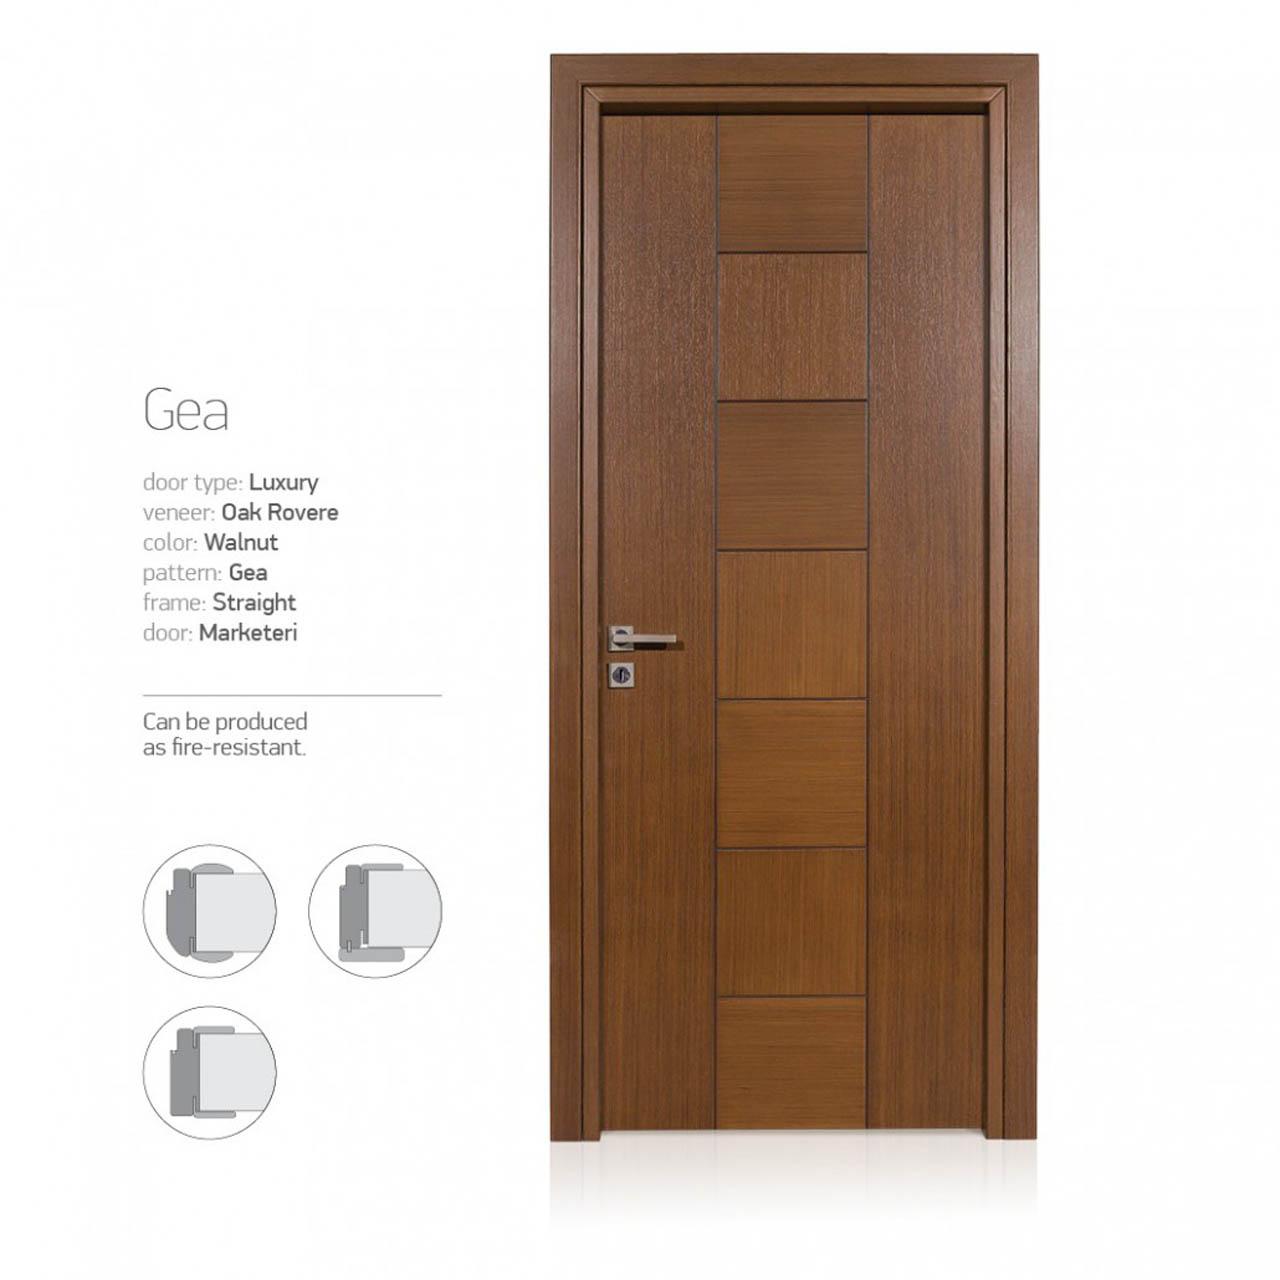 portes-site-luxury-eng-1030x1030